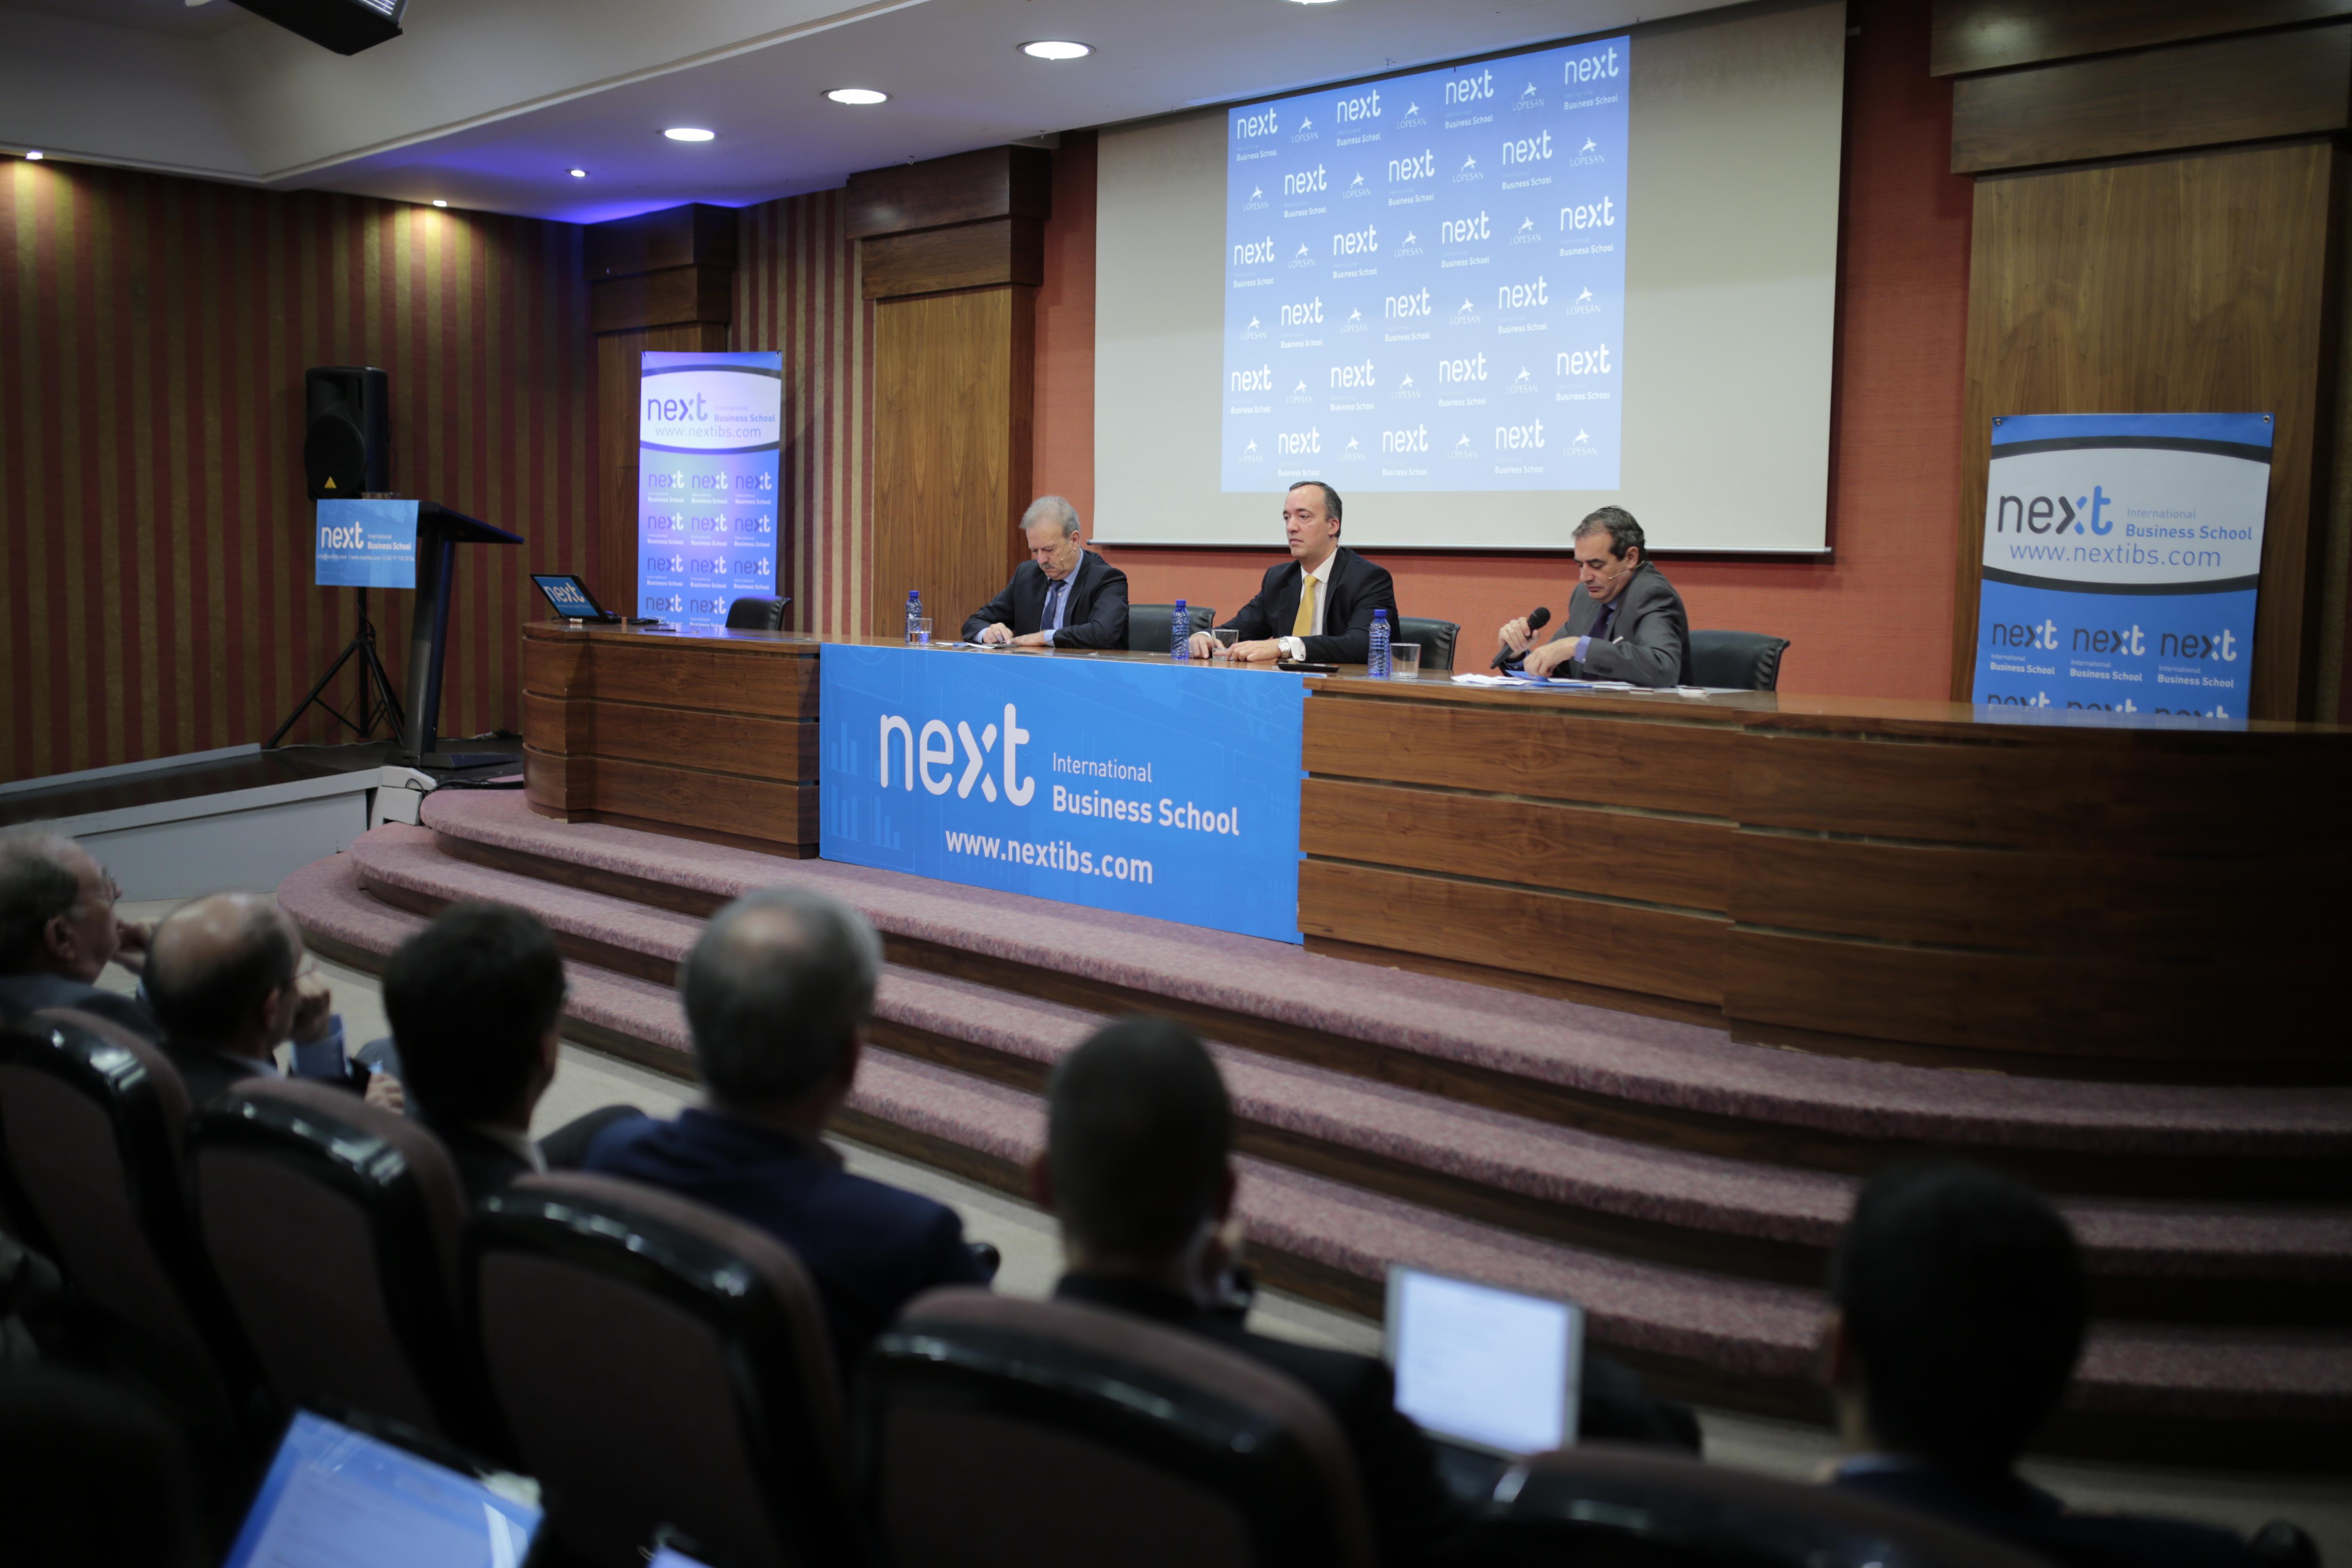 IX Foro Next IBS con Francisco Martínez Vázquez